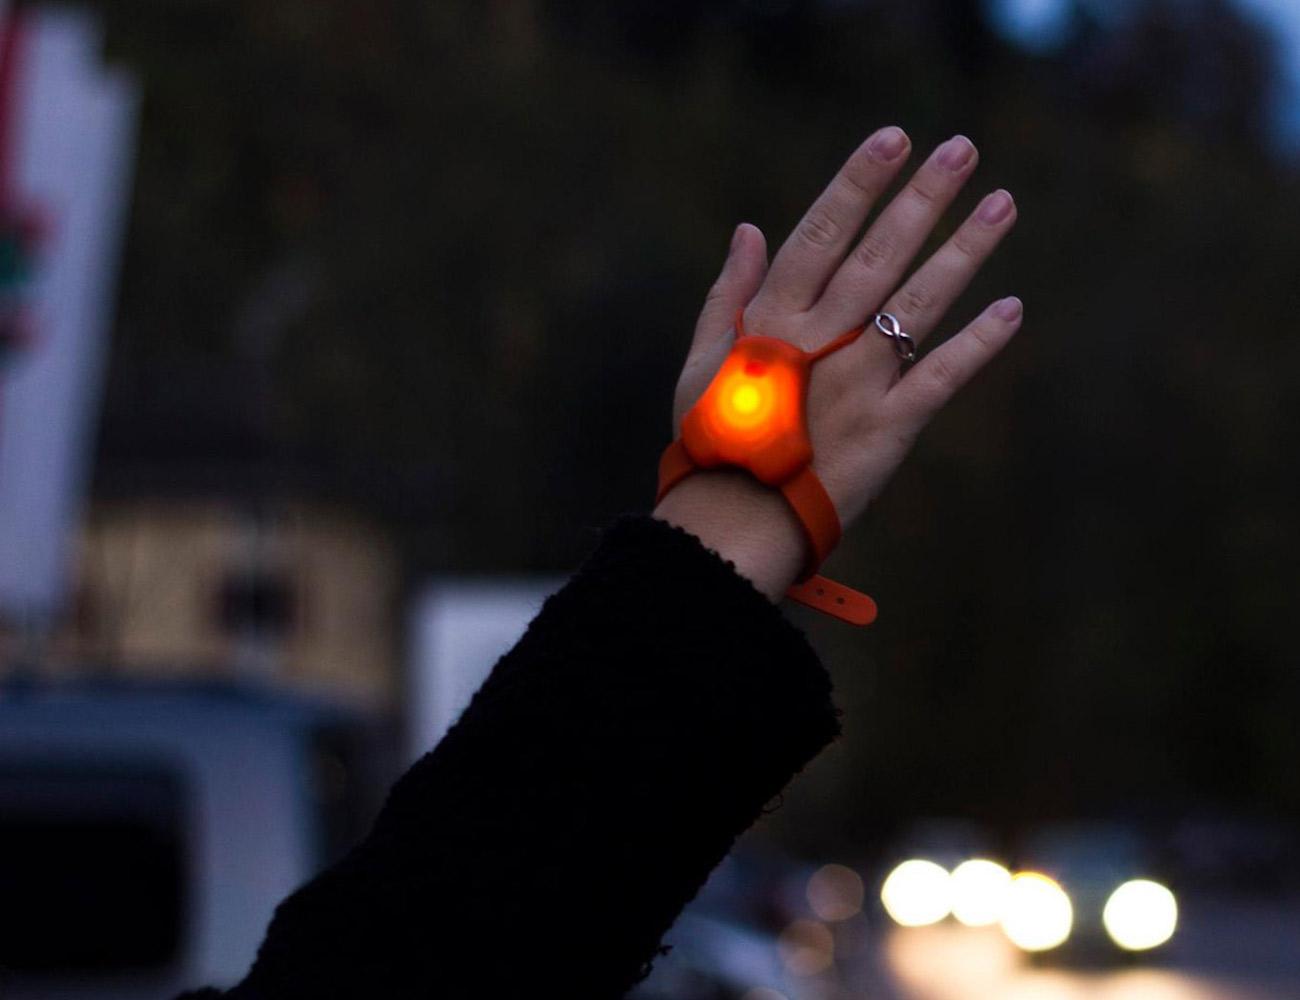 Firebox SeniTurn Wearable Safety Indicator Lights